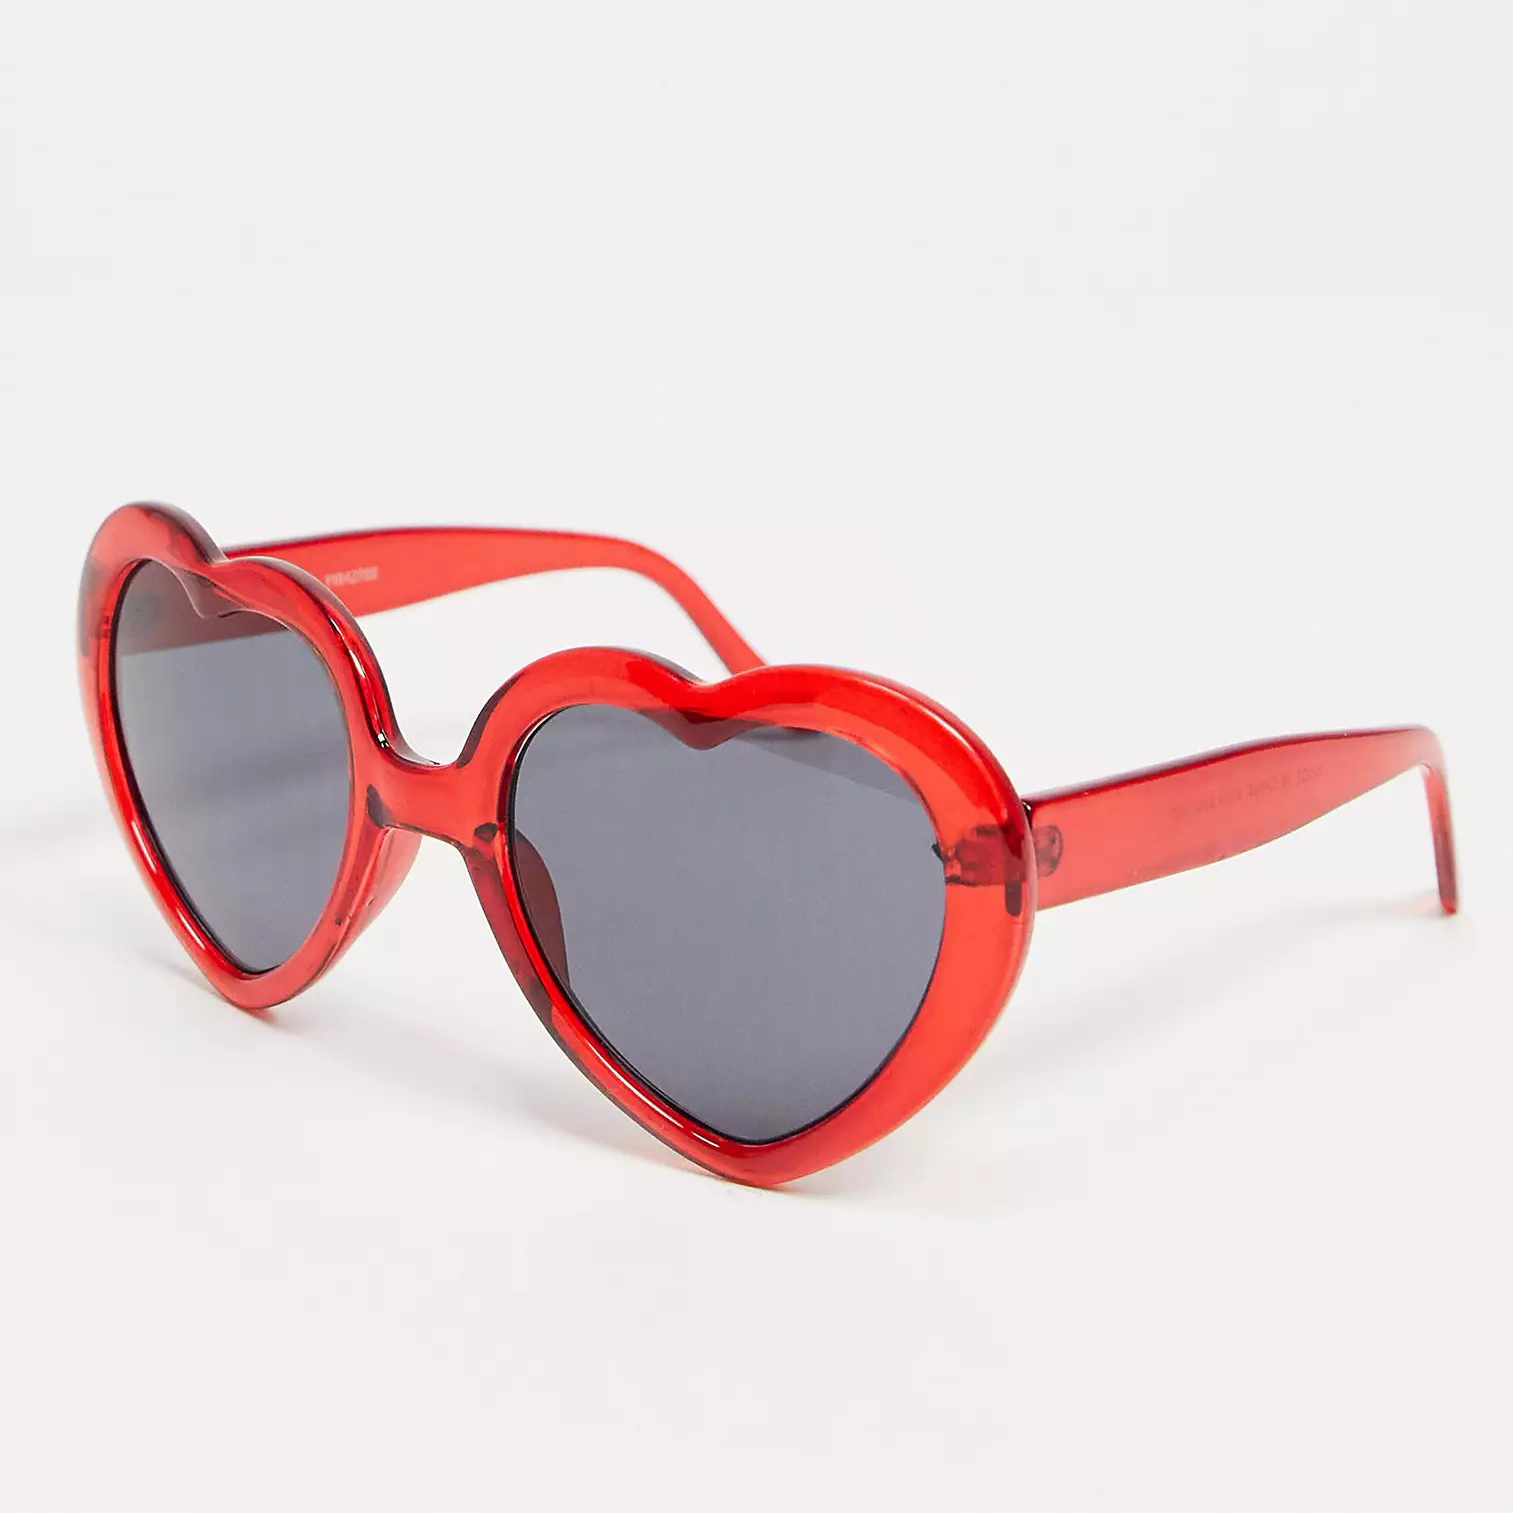 ASOS DESIGN Heart Sunglasses